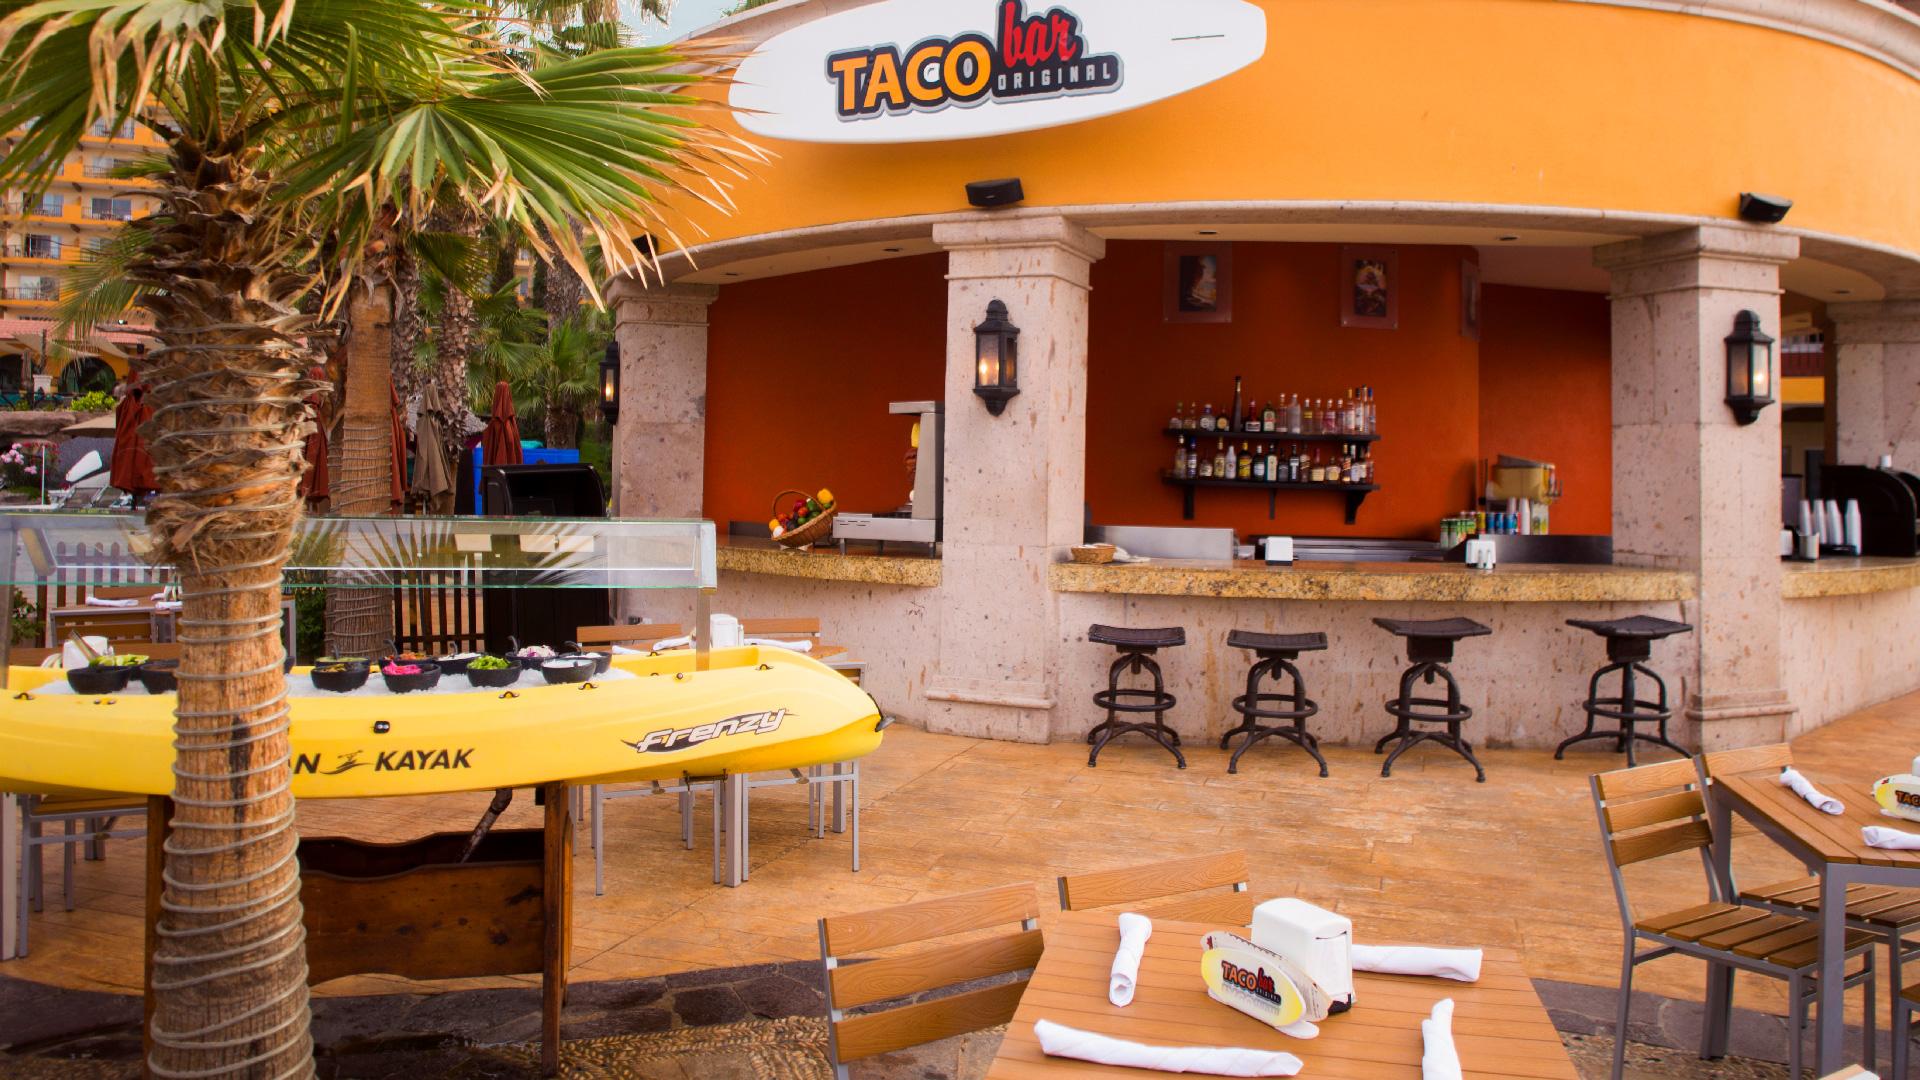 Villa del palmar cabo san lucas taco bar restaurant 1